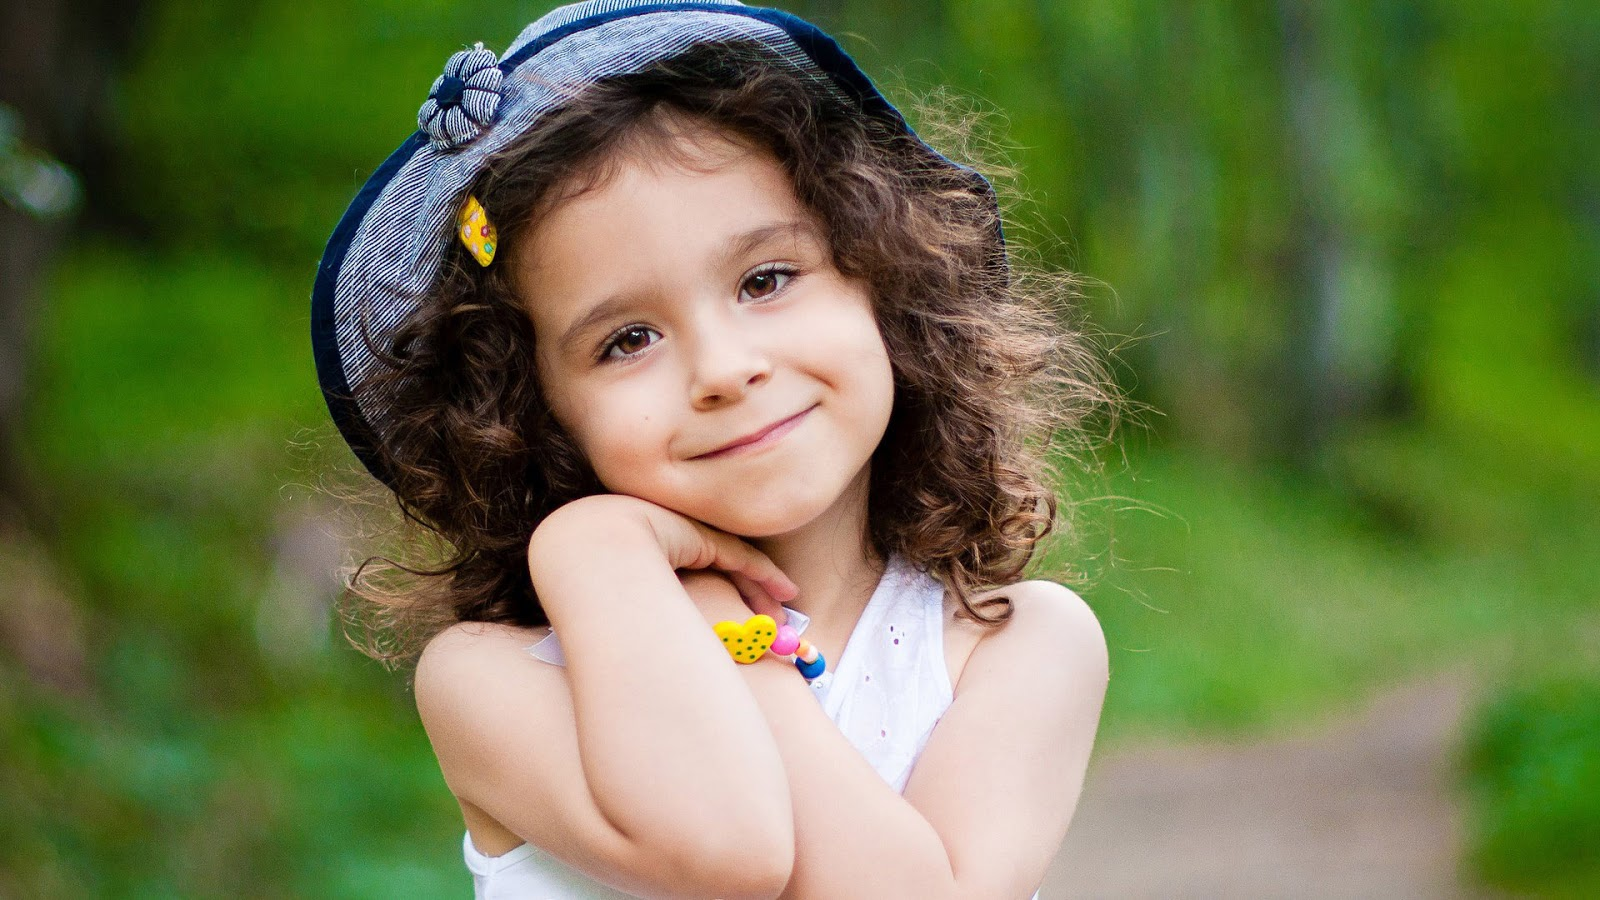 Very Cute Little Girl Hd Wallpaper Cute Little Babies